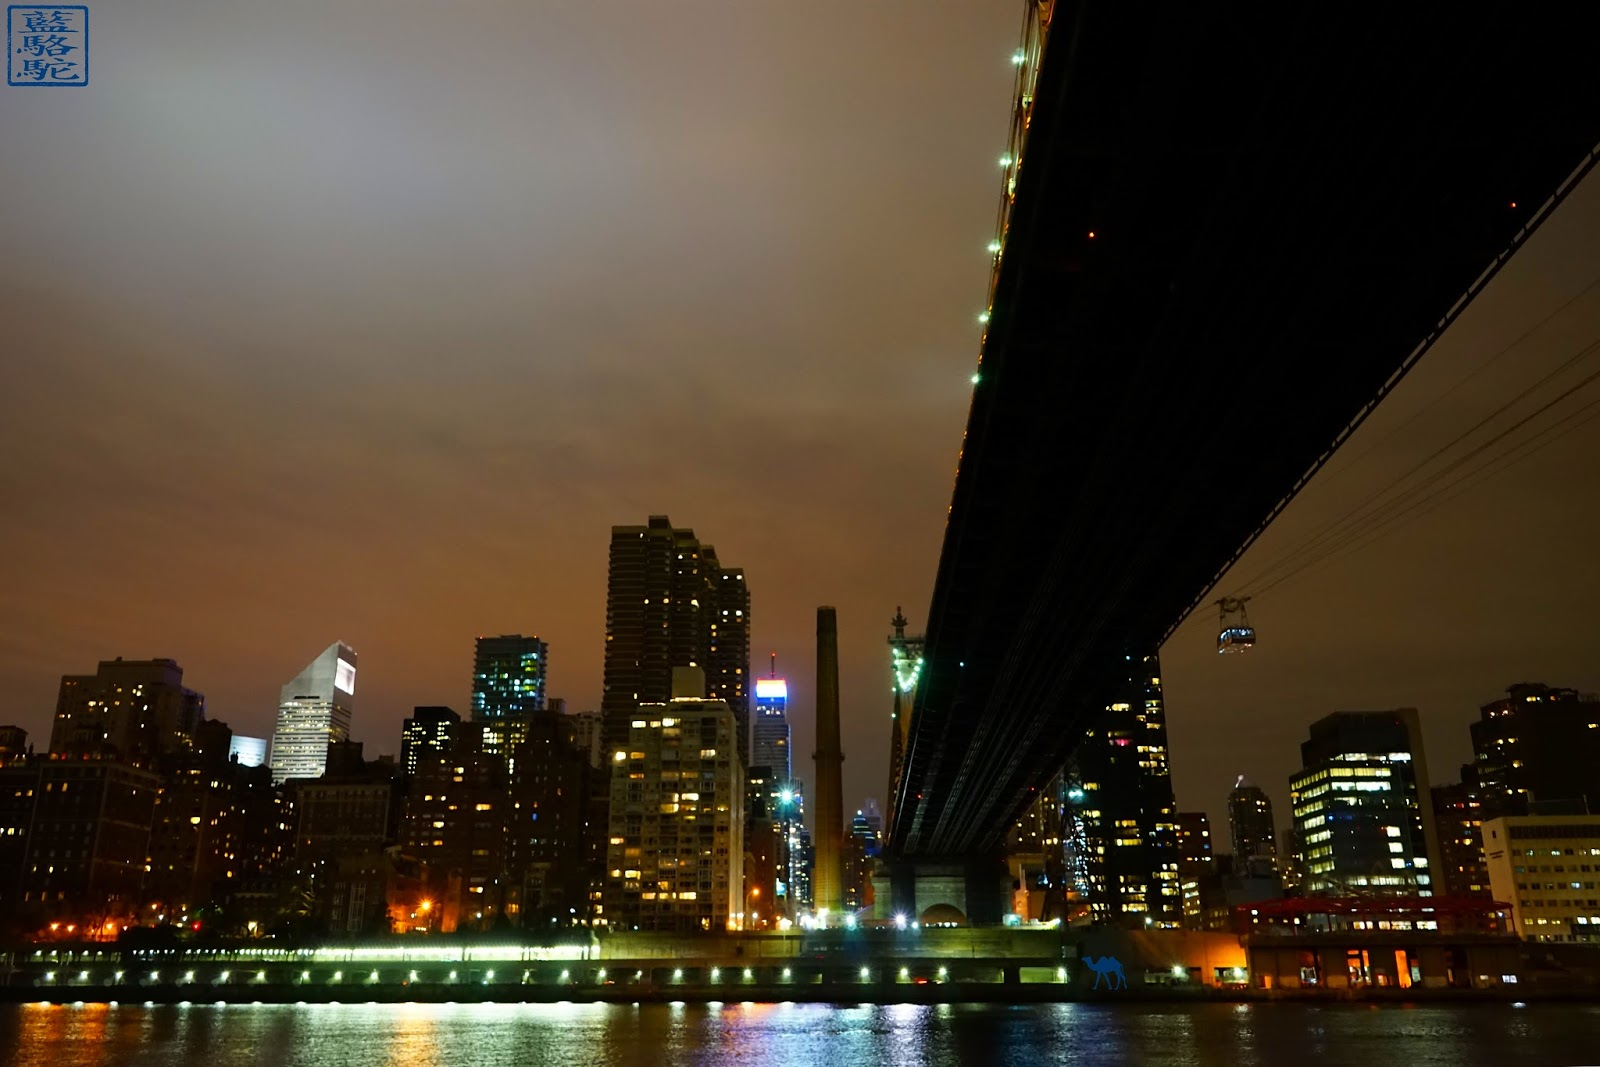 Le Chameau Bleu - Vue de Manhattan depuis Roosevelt Island